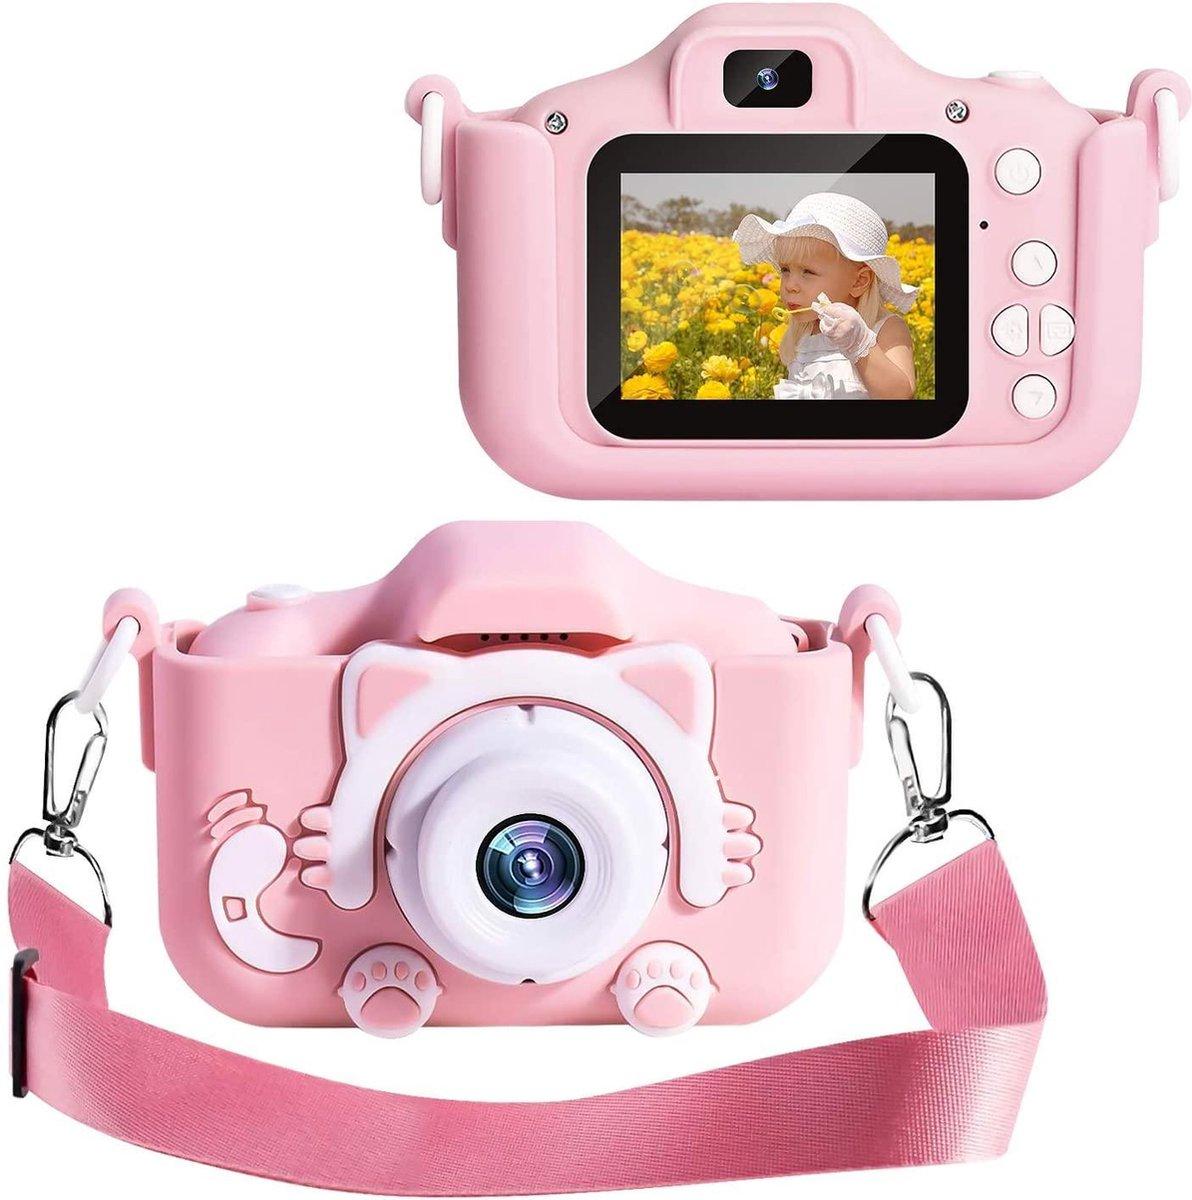 Digitale Kindercamera HD 1080p 32GB Inclusief Micro SD Kaart - Vlog Camera voor Kinderen - Digitaal